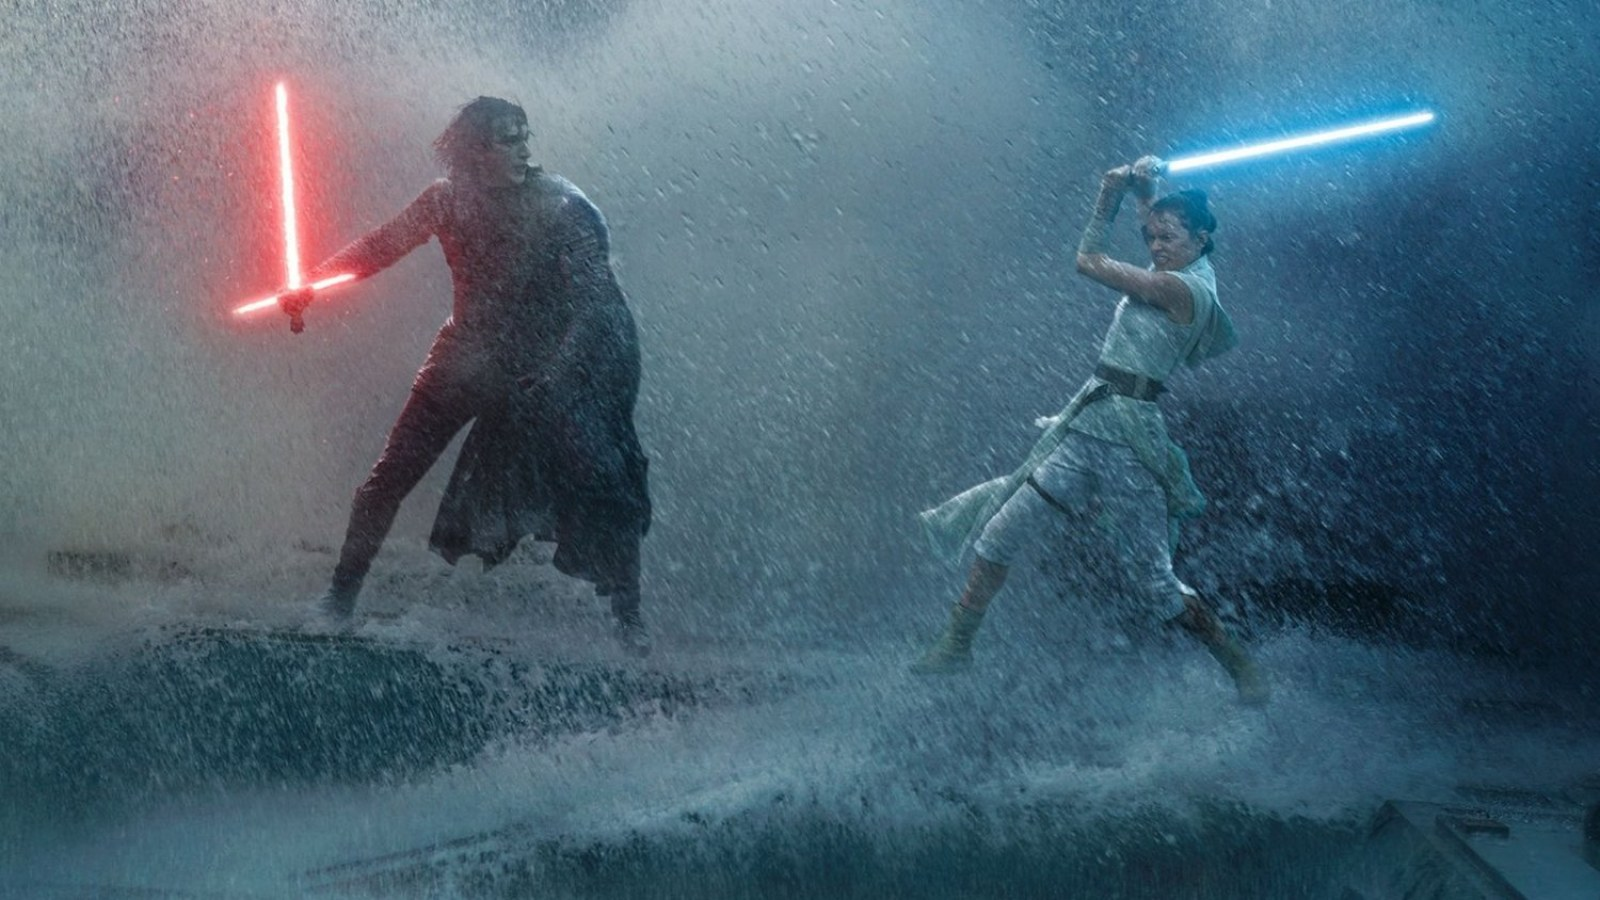 Film Star Wars Episode IX The Rise of Skywalker